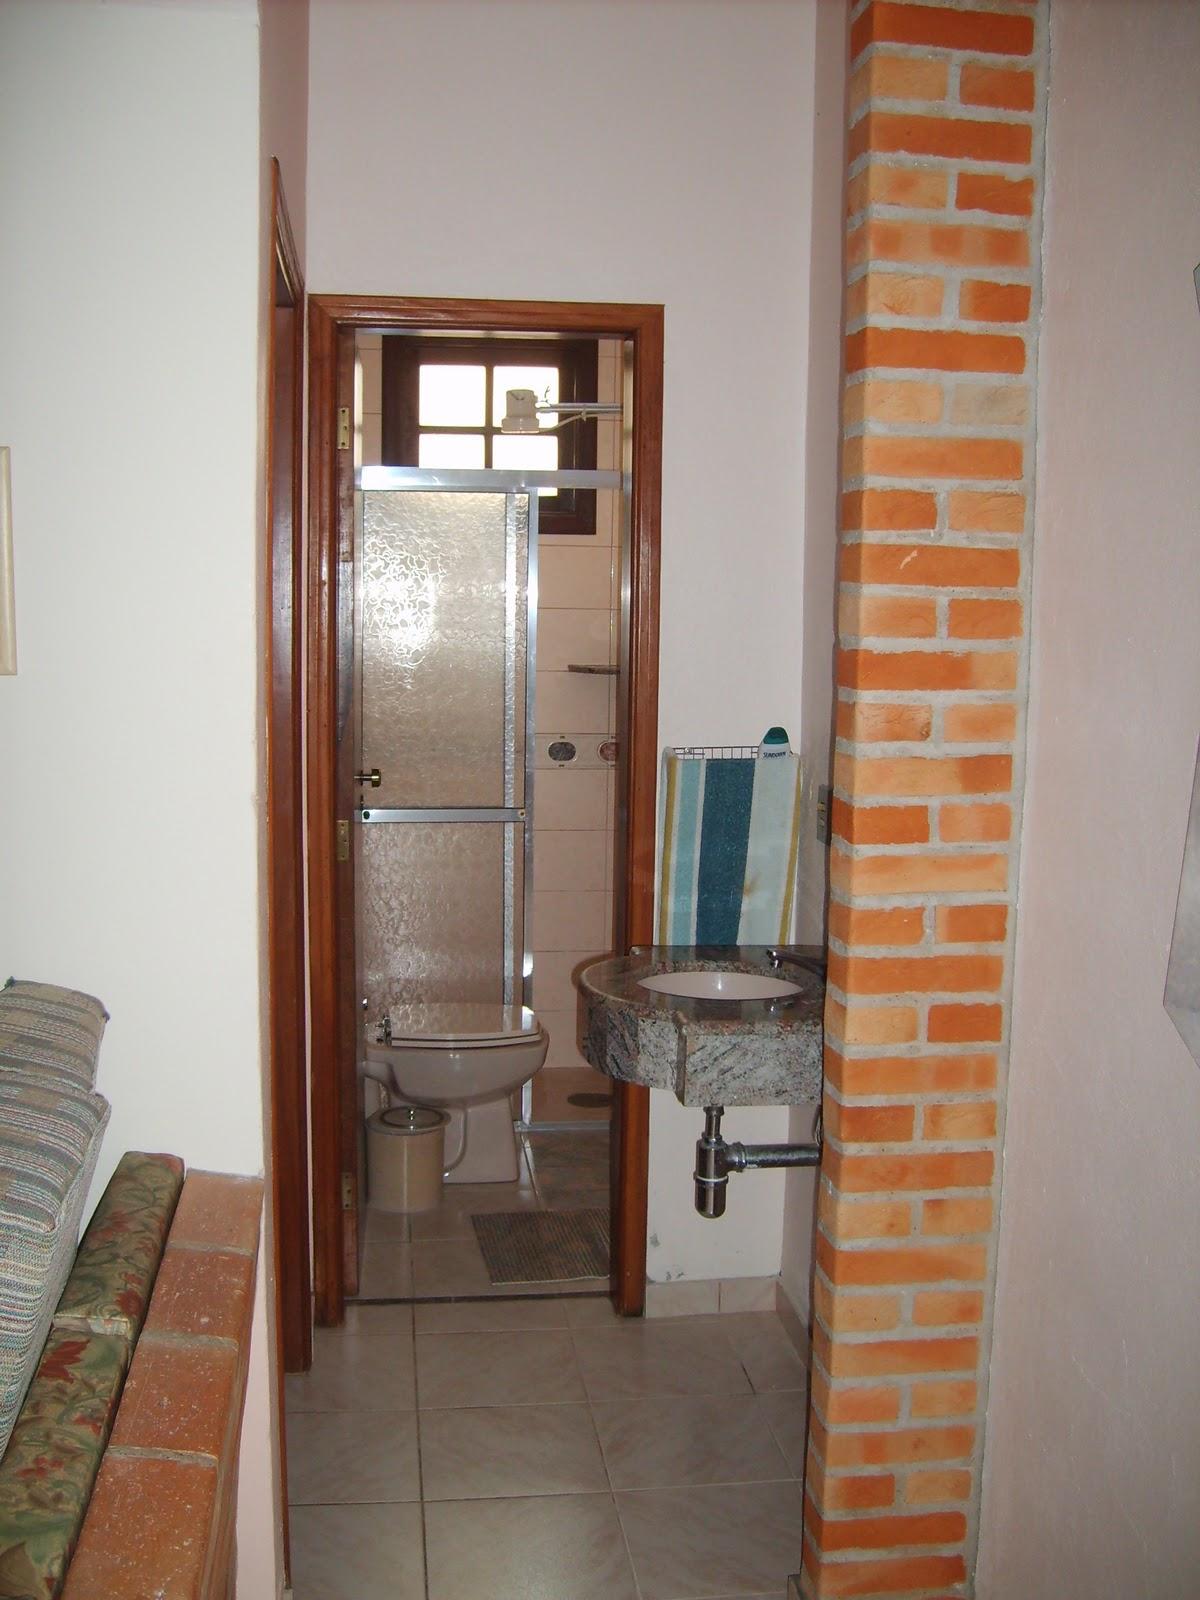 Imagens de #A85023  lateral para o quarto do piso térreo da casa (vista para o banheiro 1200x1600 px 2906 Box Banheiro Guaratuba